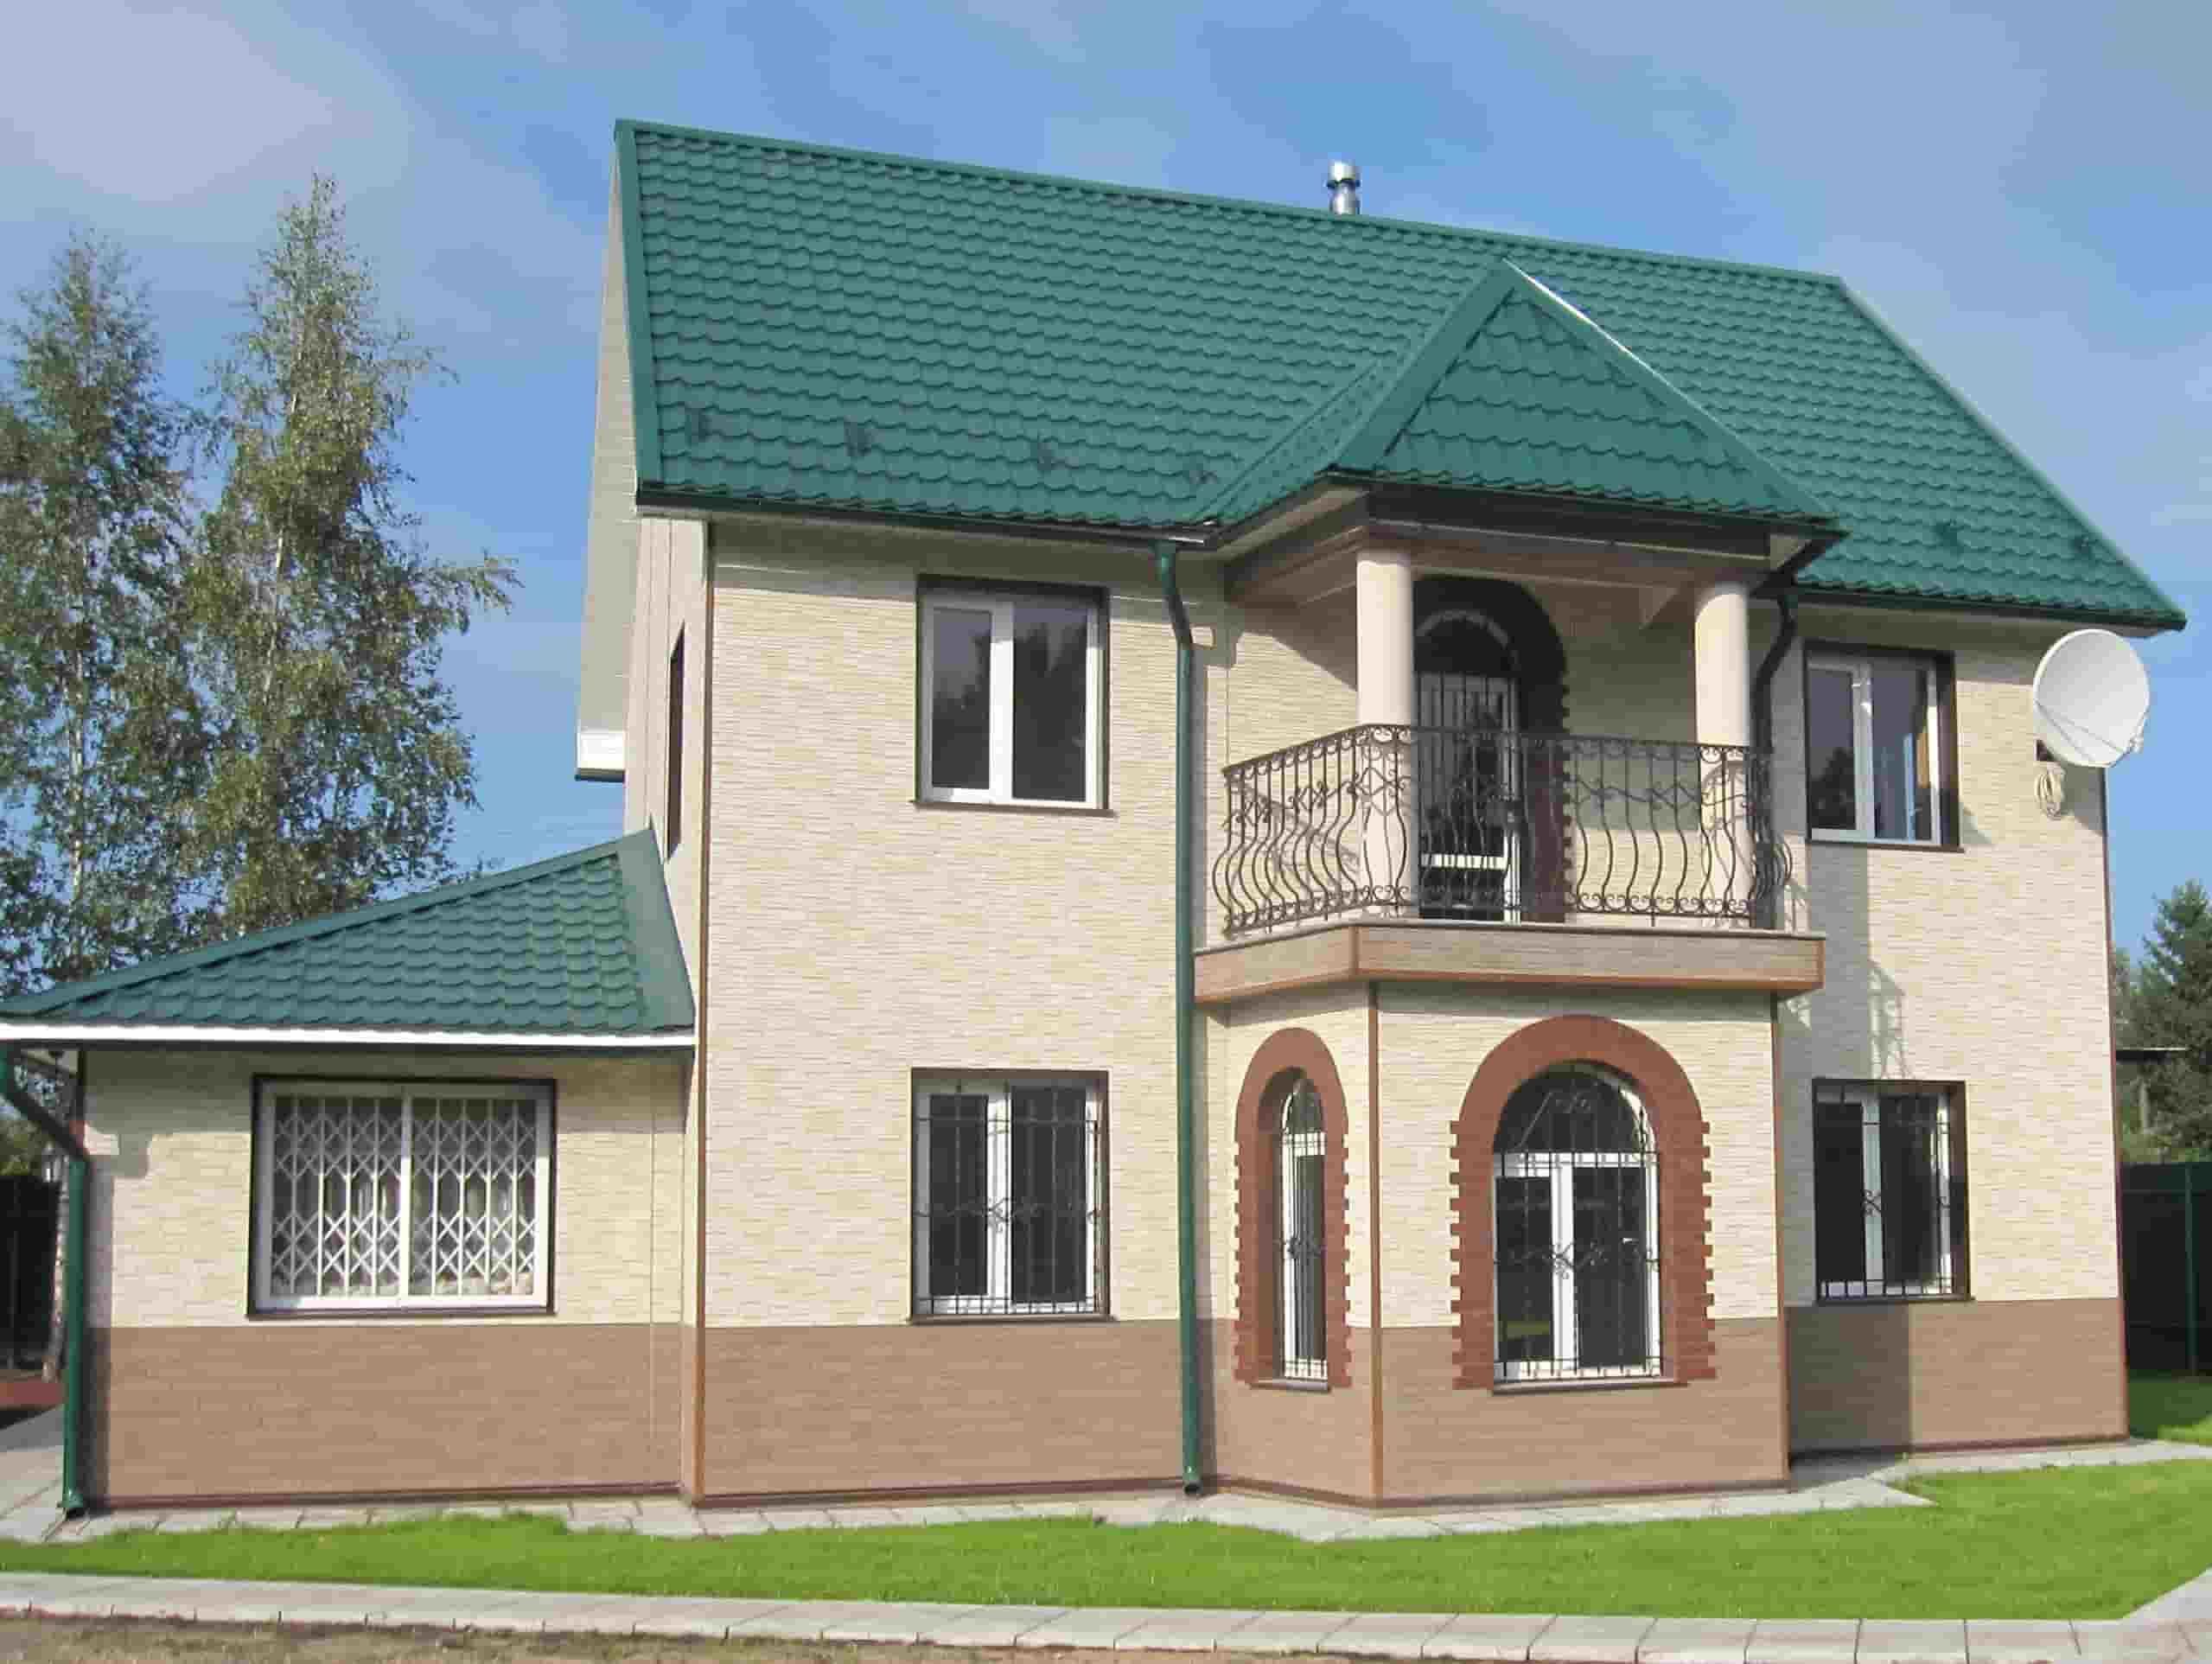 nichiha-fasadnie-panili-spb